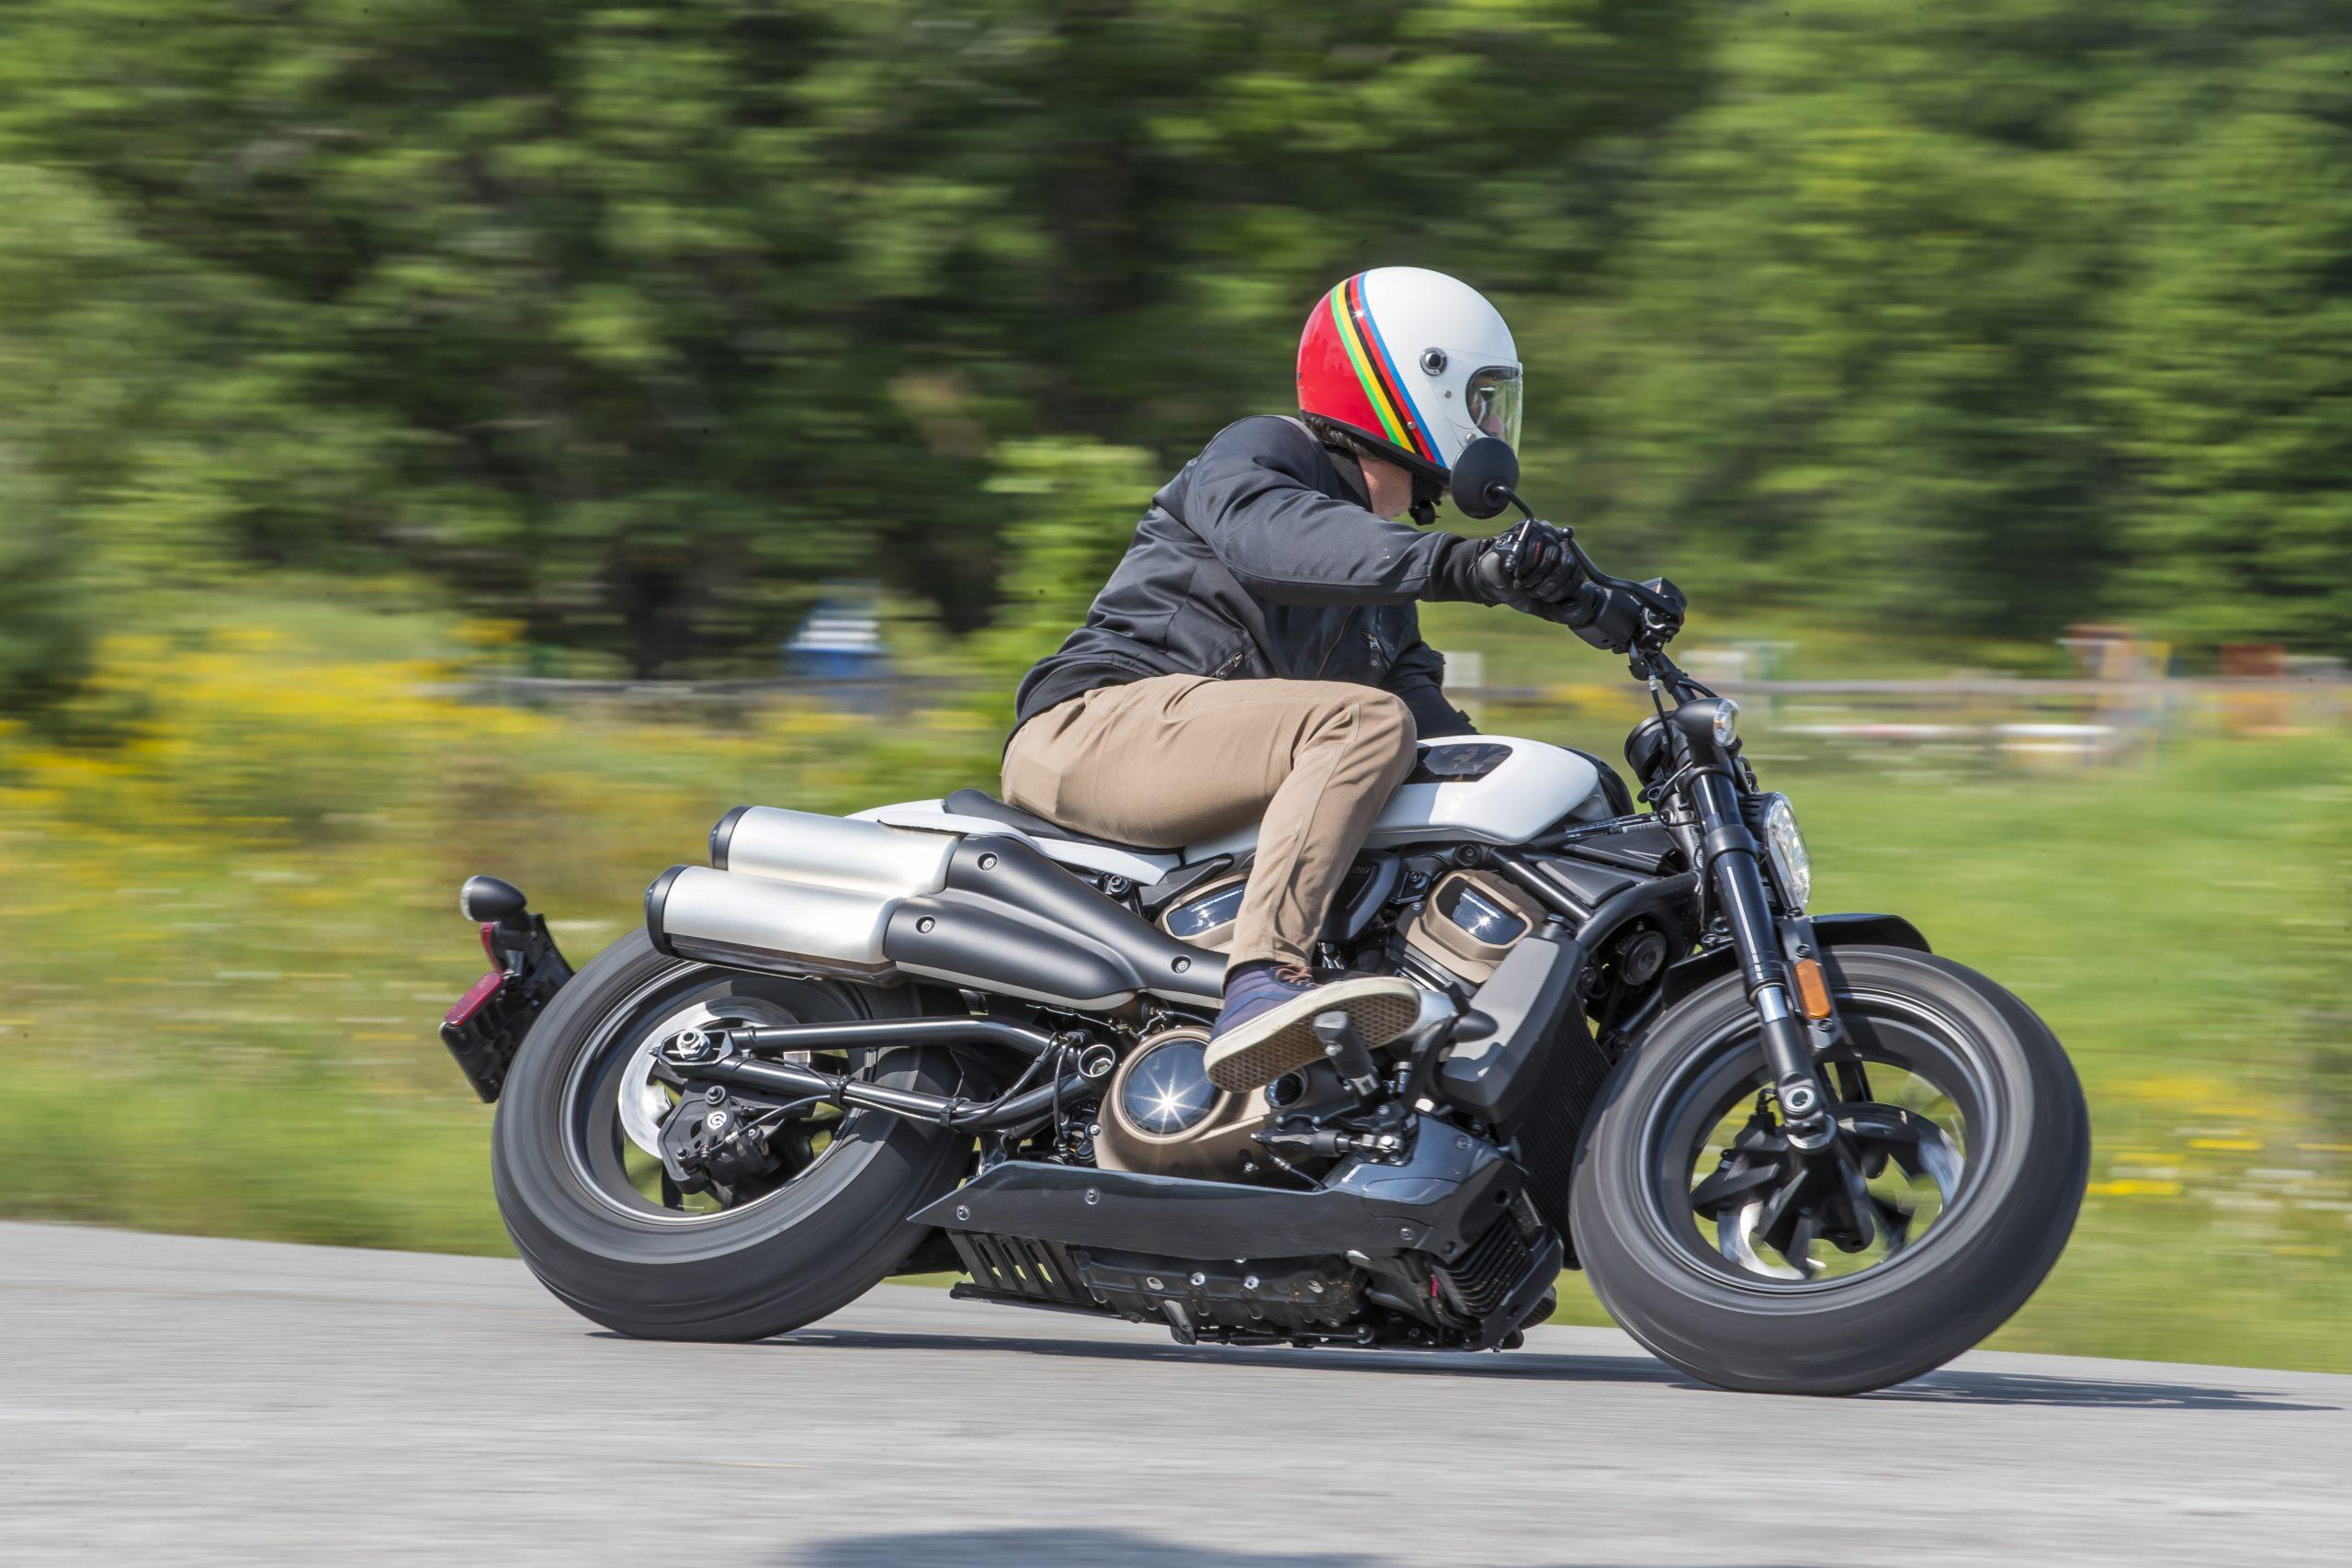 2021 Harley Davidson Sportster